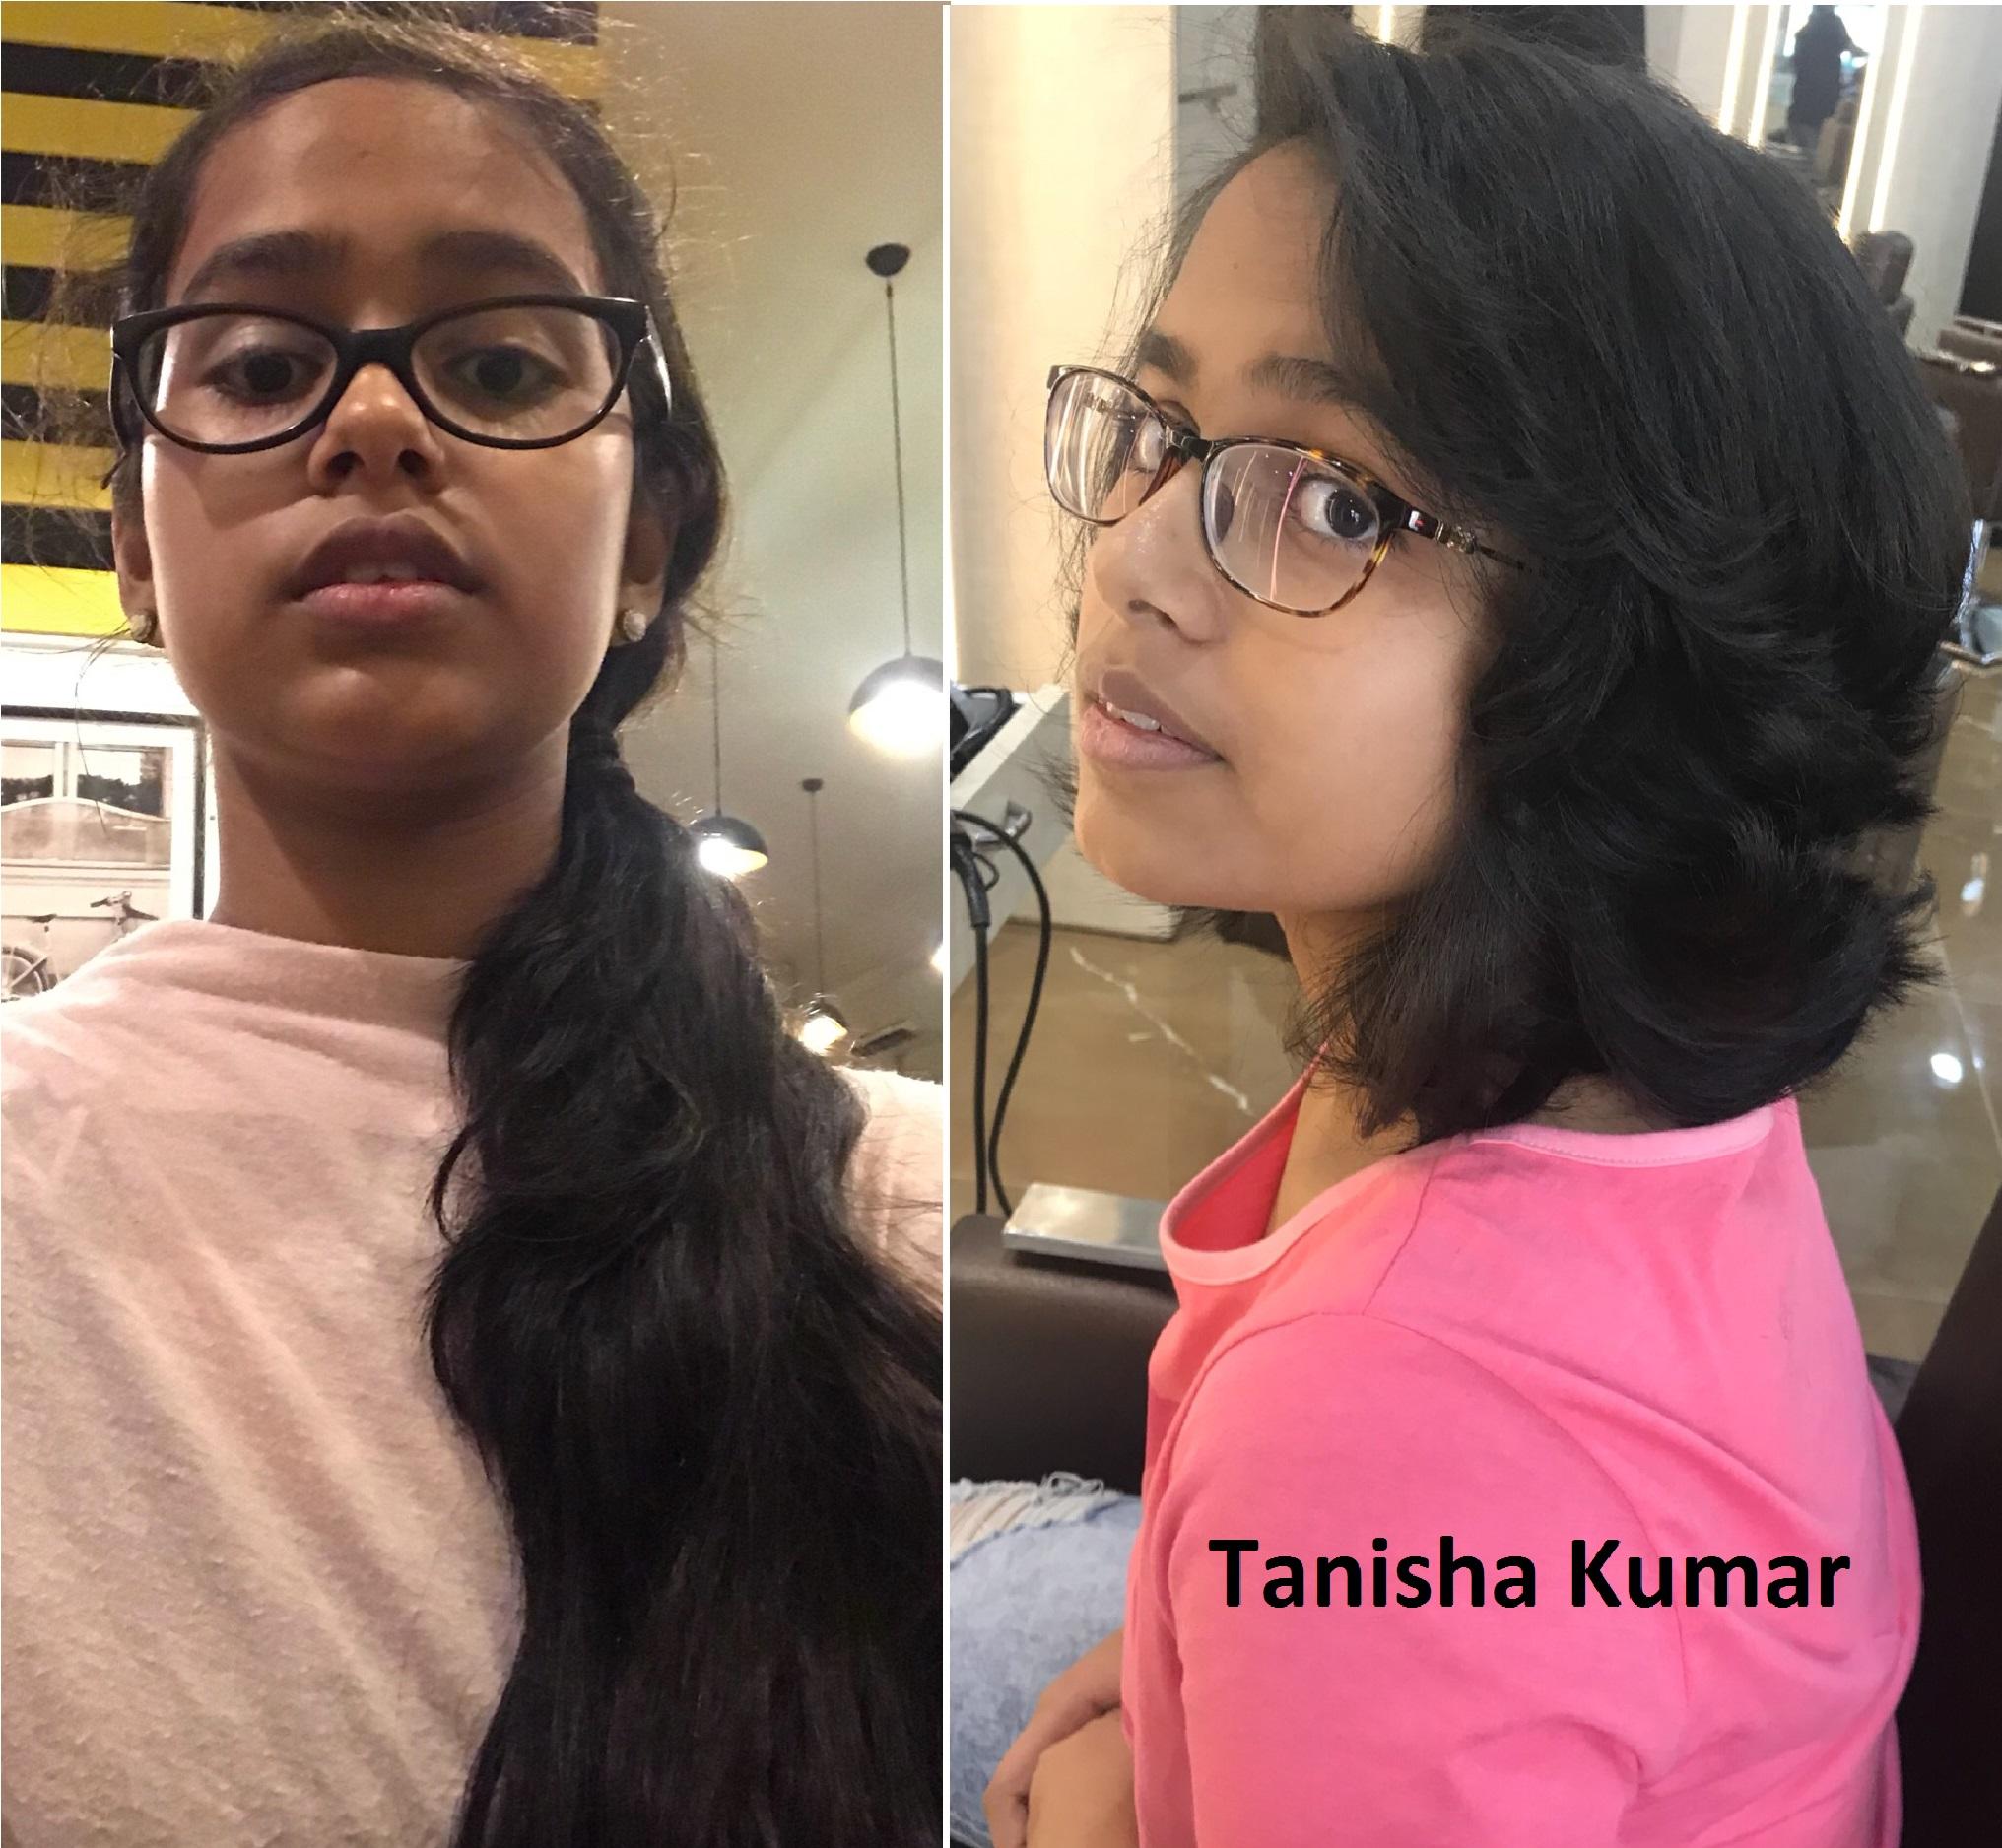 Tanisha Kumar